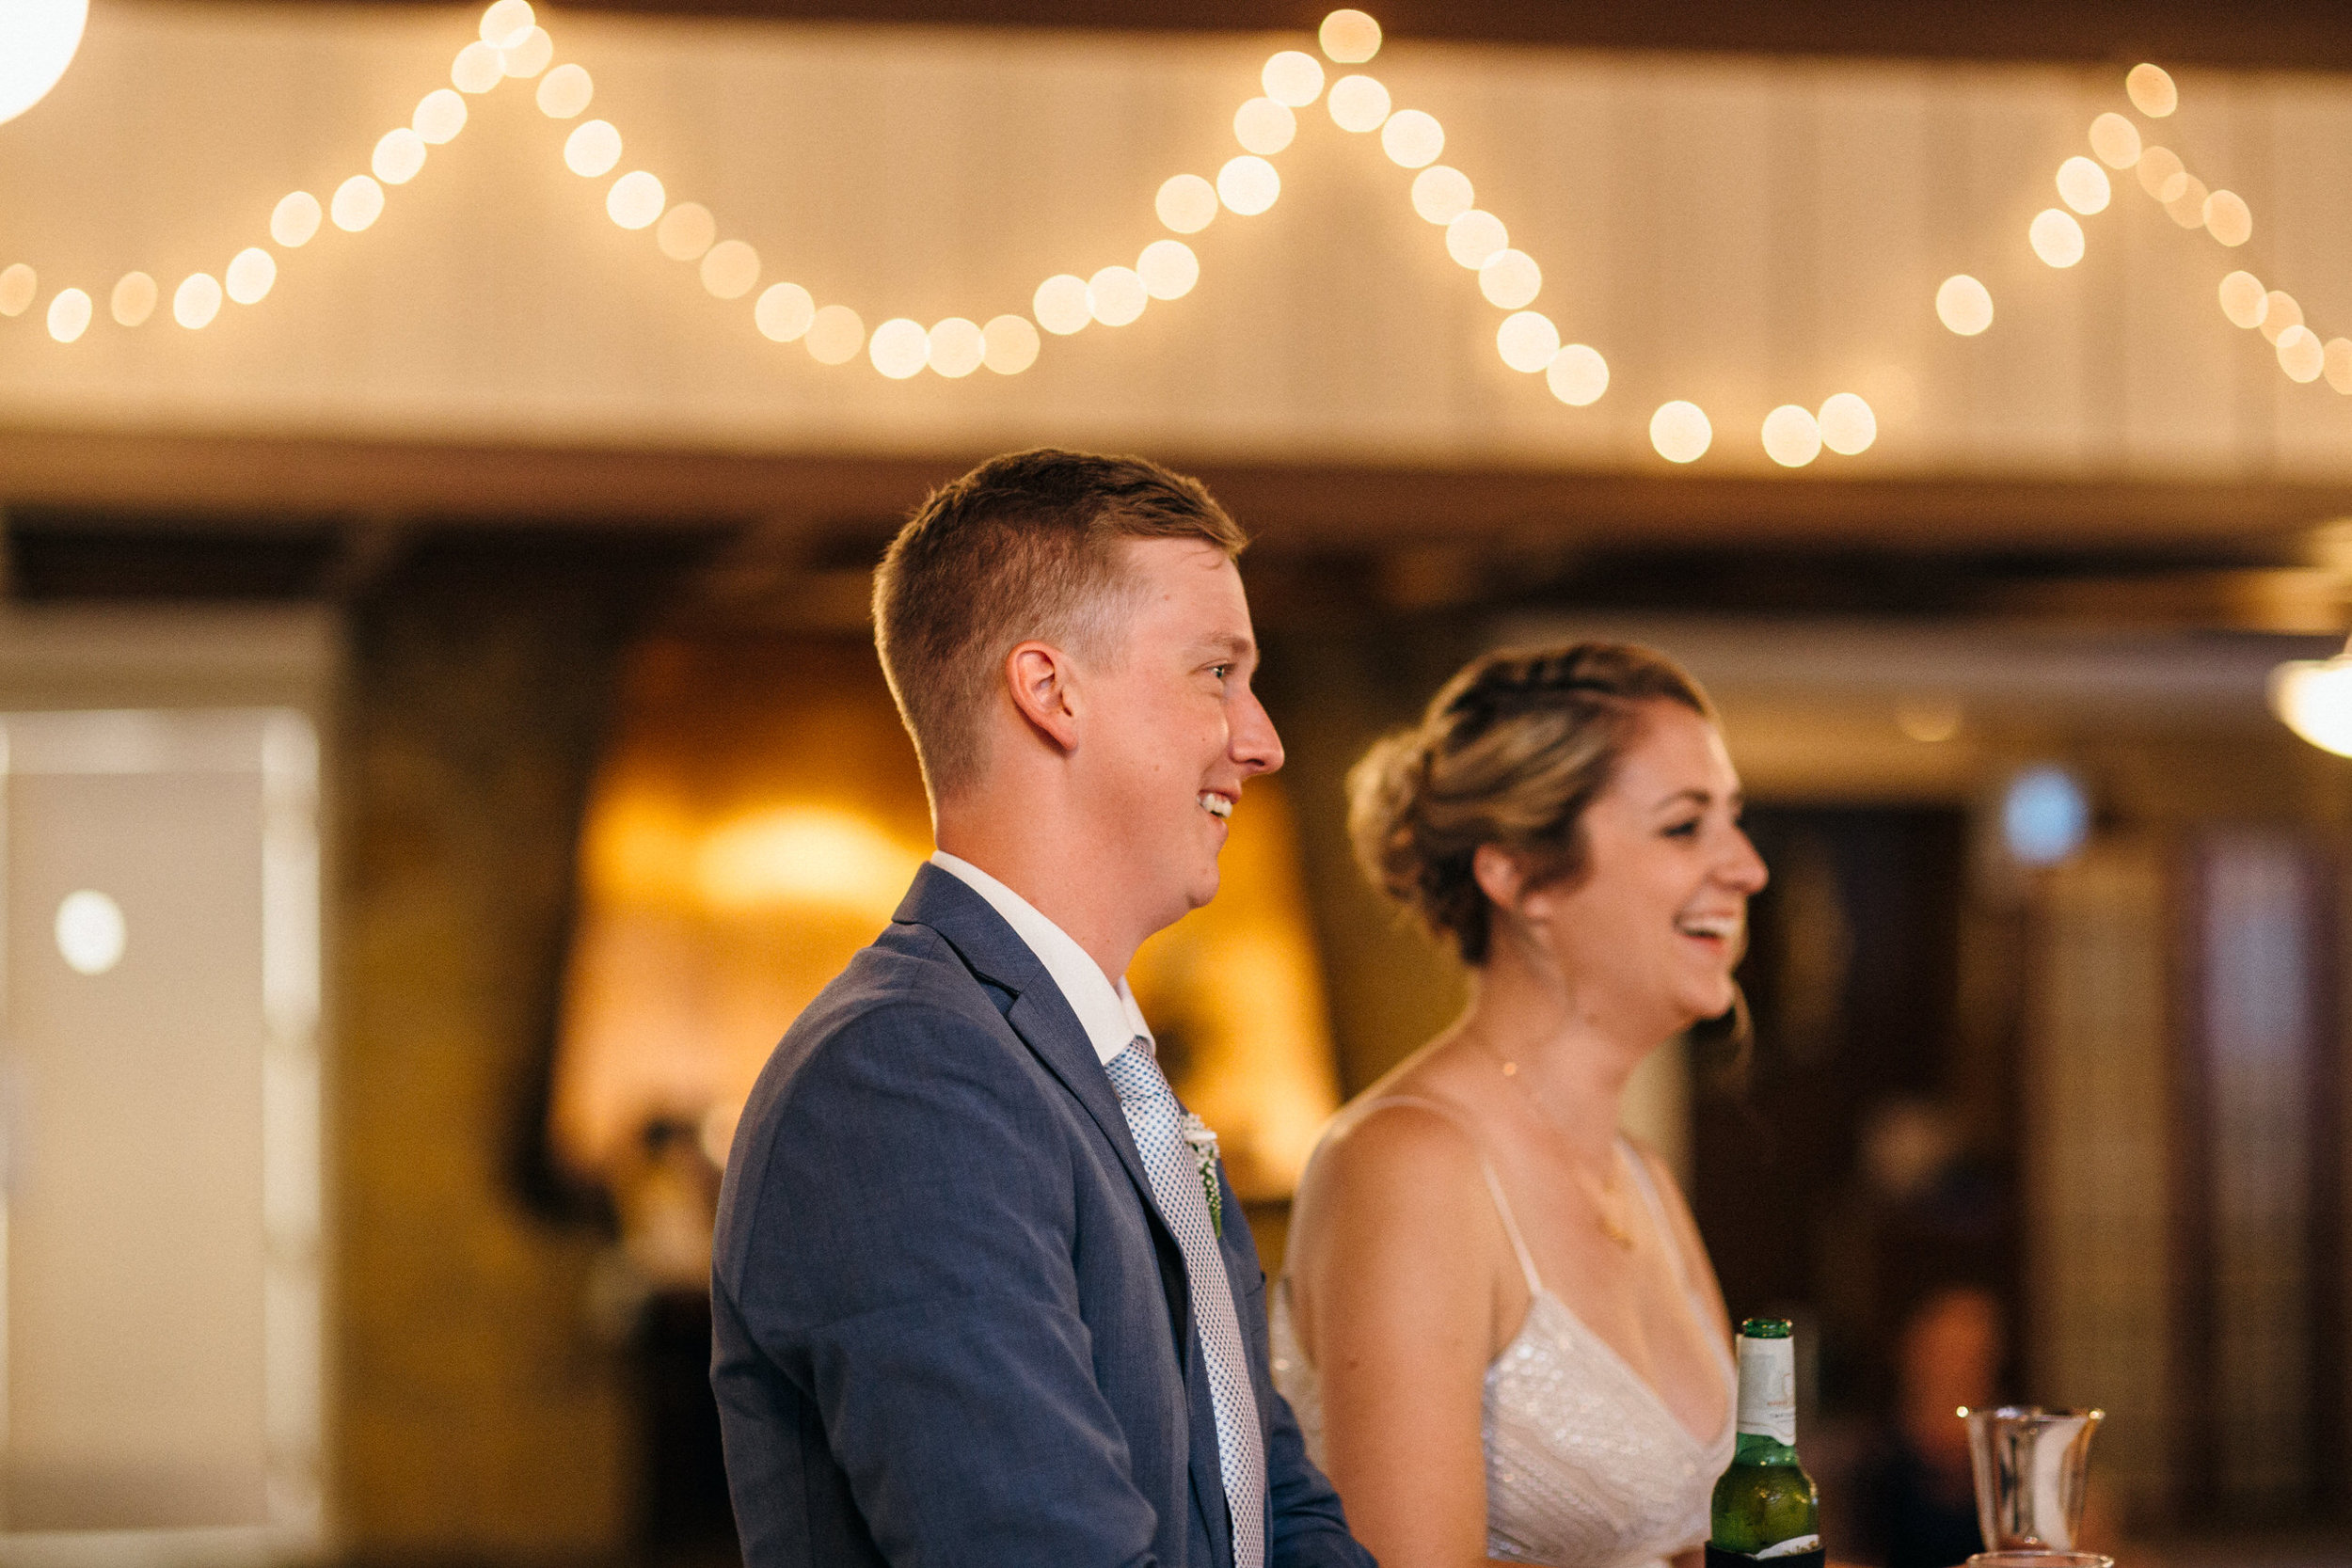 Laurelhurst Park club wedding photographer Portand pdx Oregon086.JPG